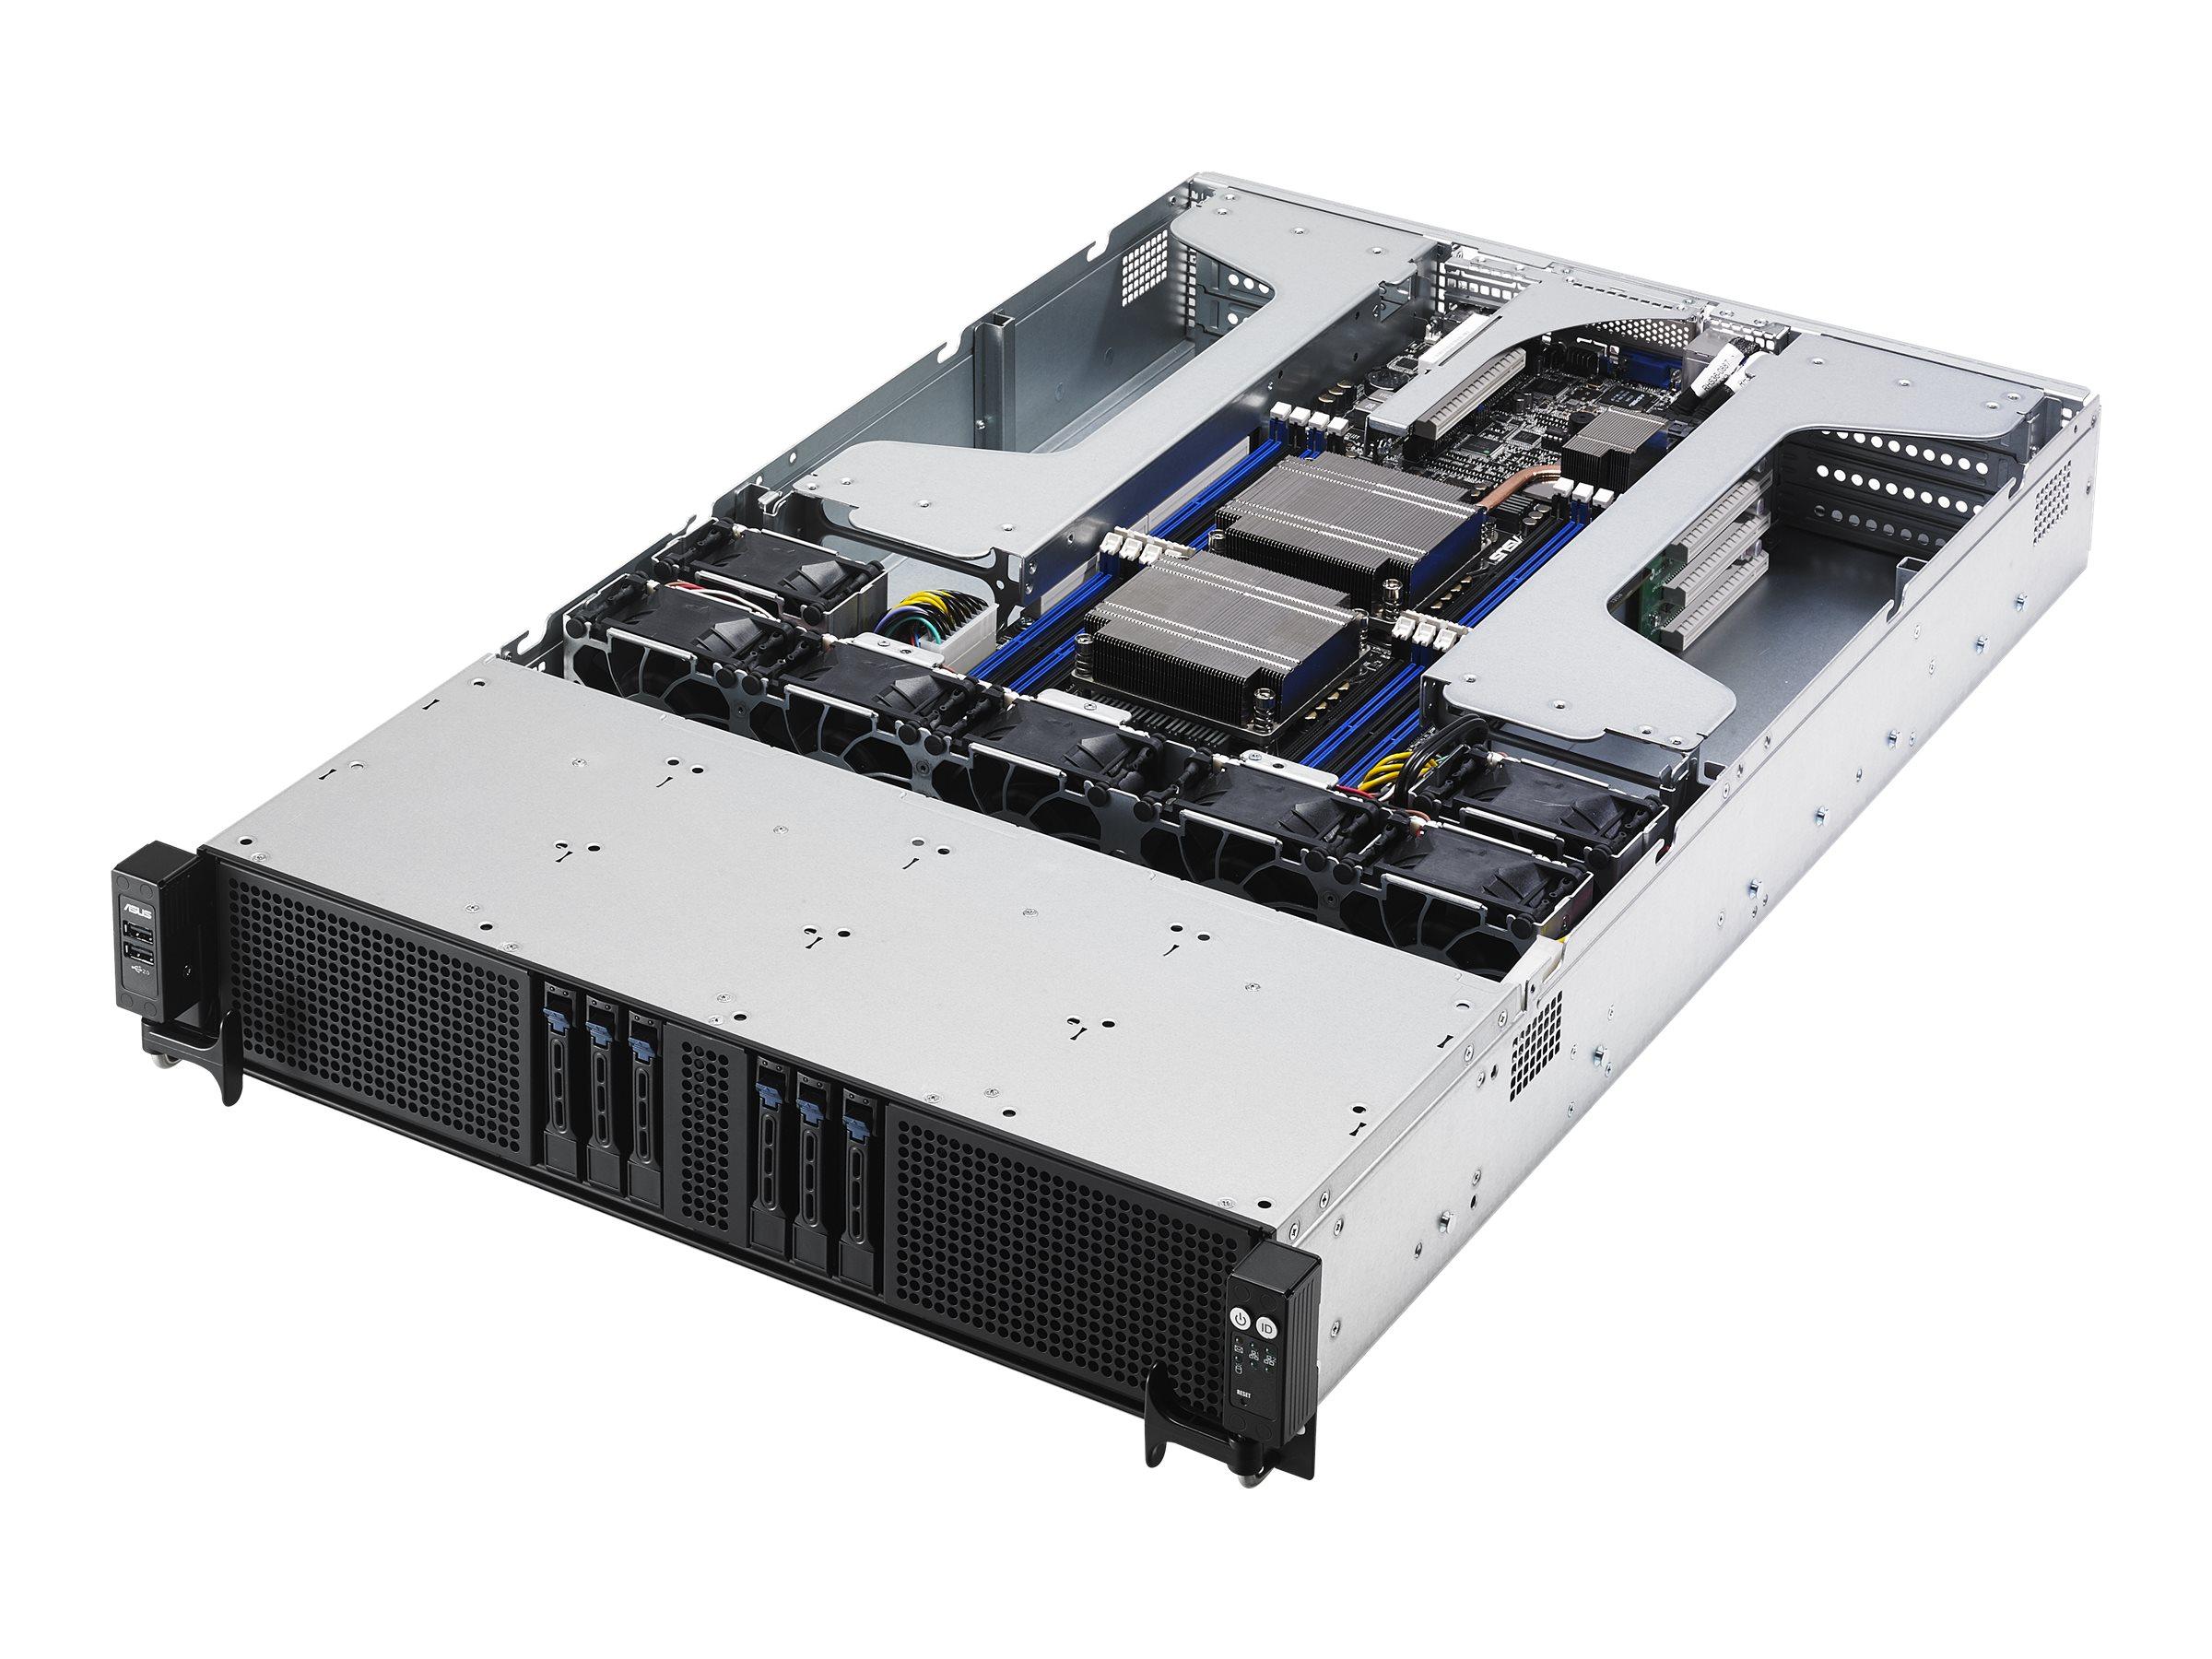 "ASUS ESC4000 G3S - Server - Rack-Montage - 2U - zweiweg - keine CPU - RAM 0 GB - SATA - Hot-Swap 6.4 cm (2.5"")"